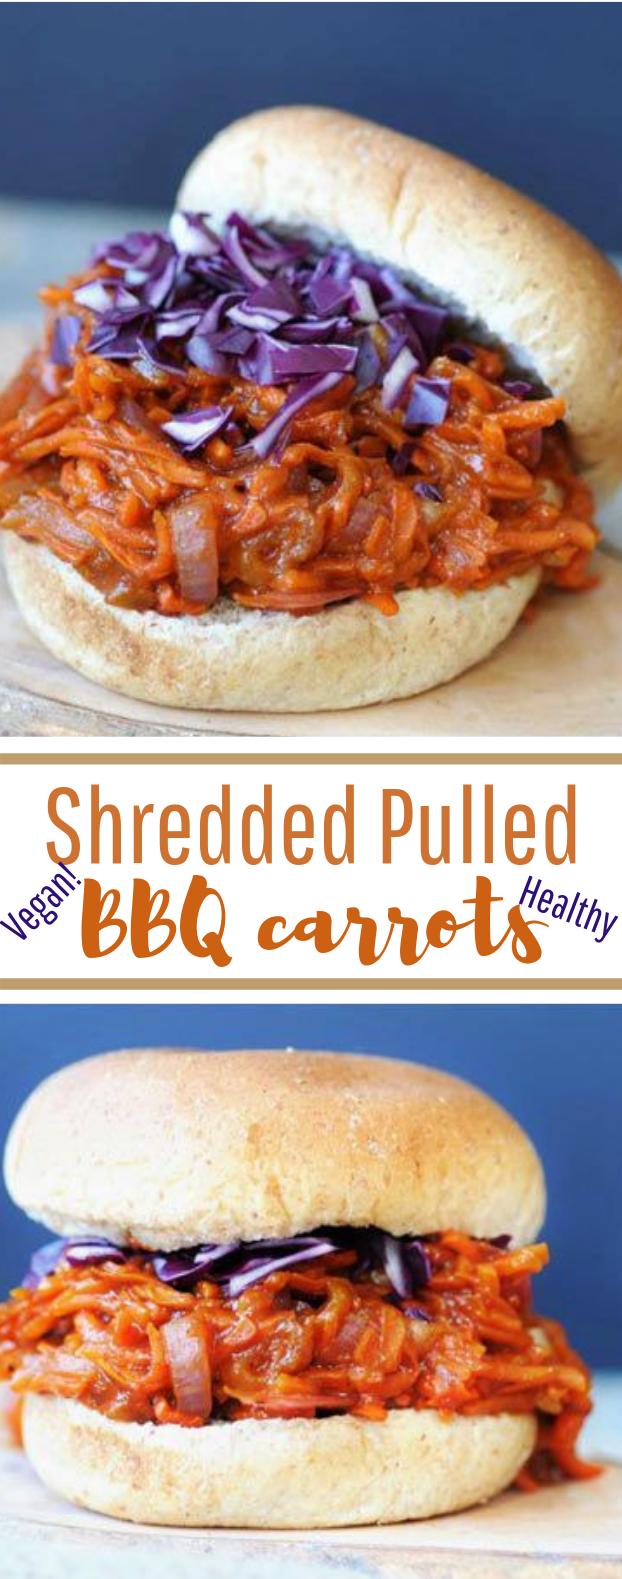 Shredded Pulled BBQ carrots #healthy #vegetarian